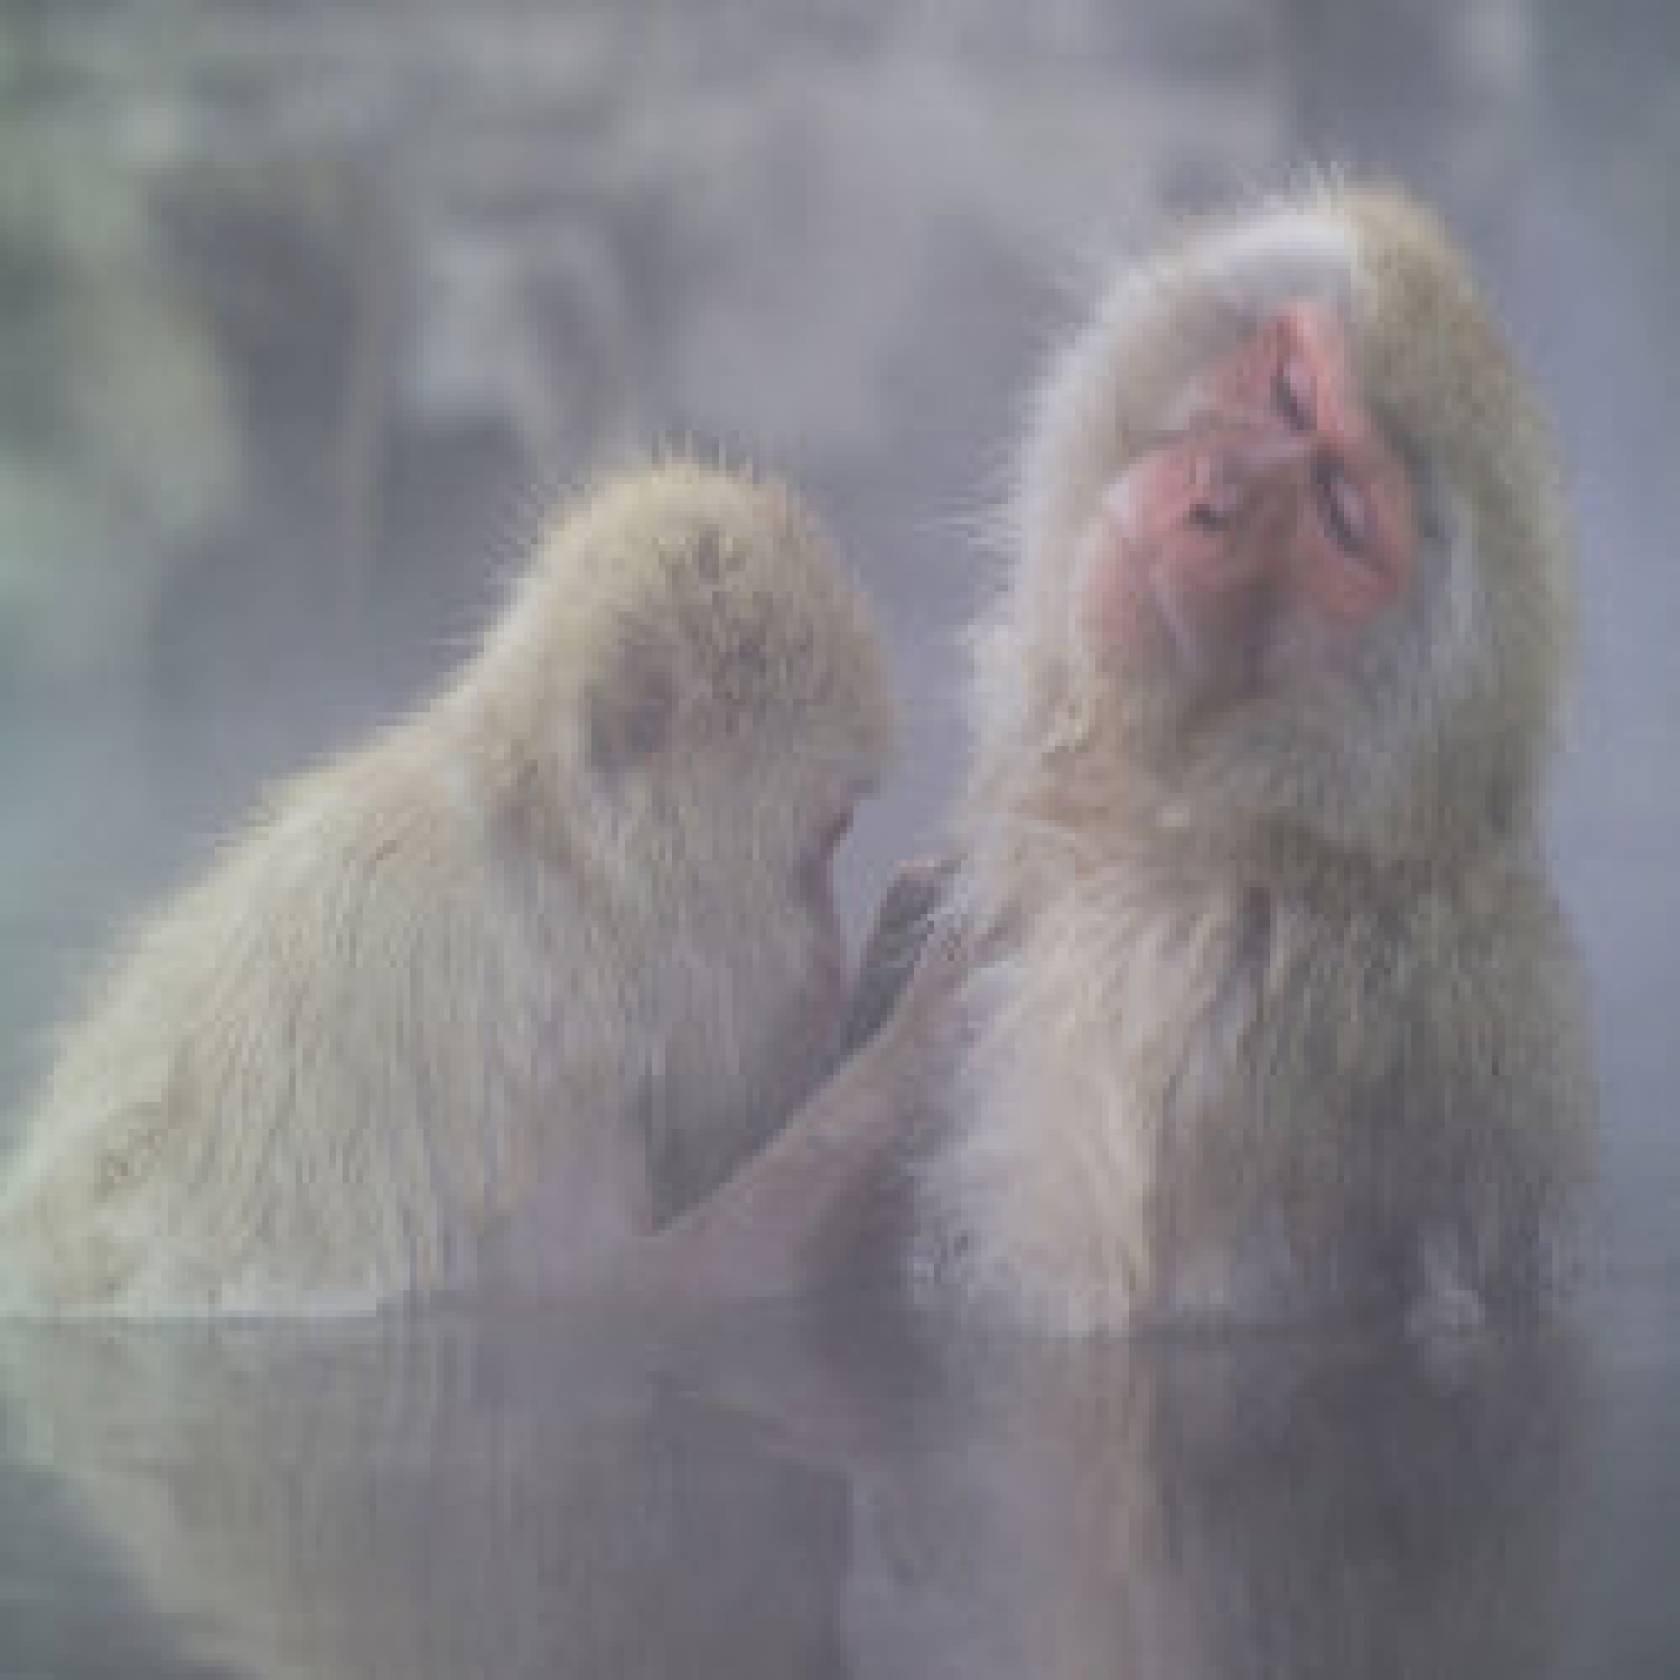 Winter in Japan: SNOW MONKEYS bath in Japanese hot springs ONSEN